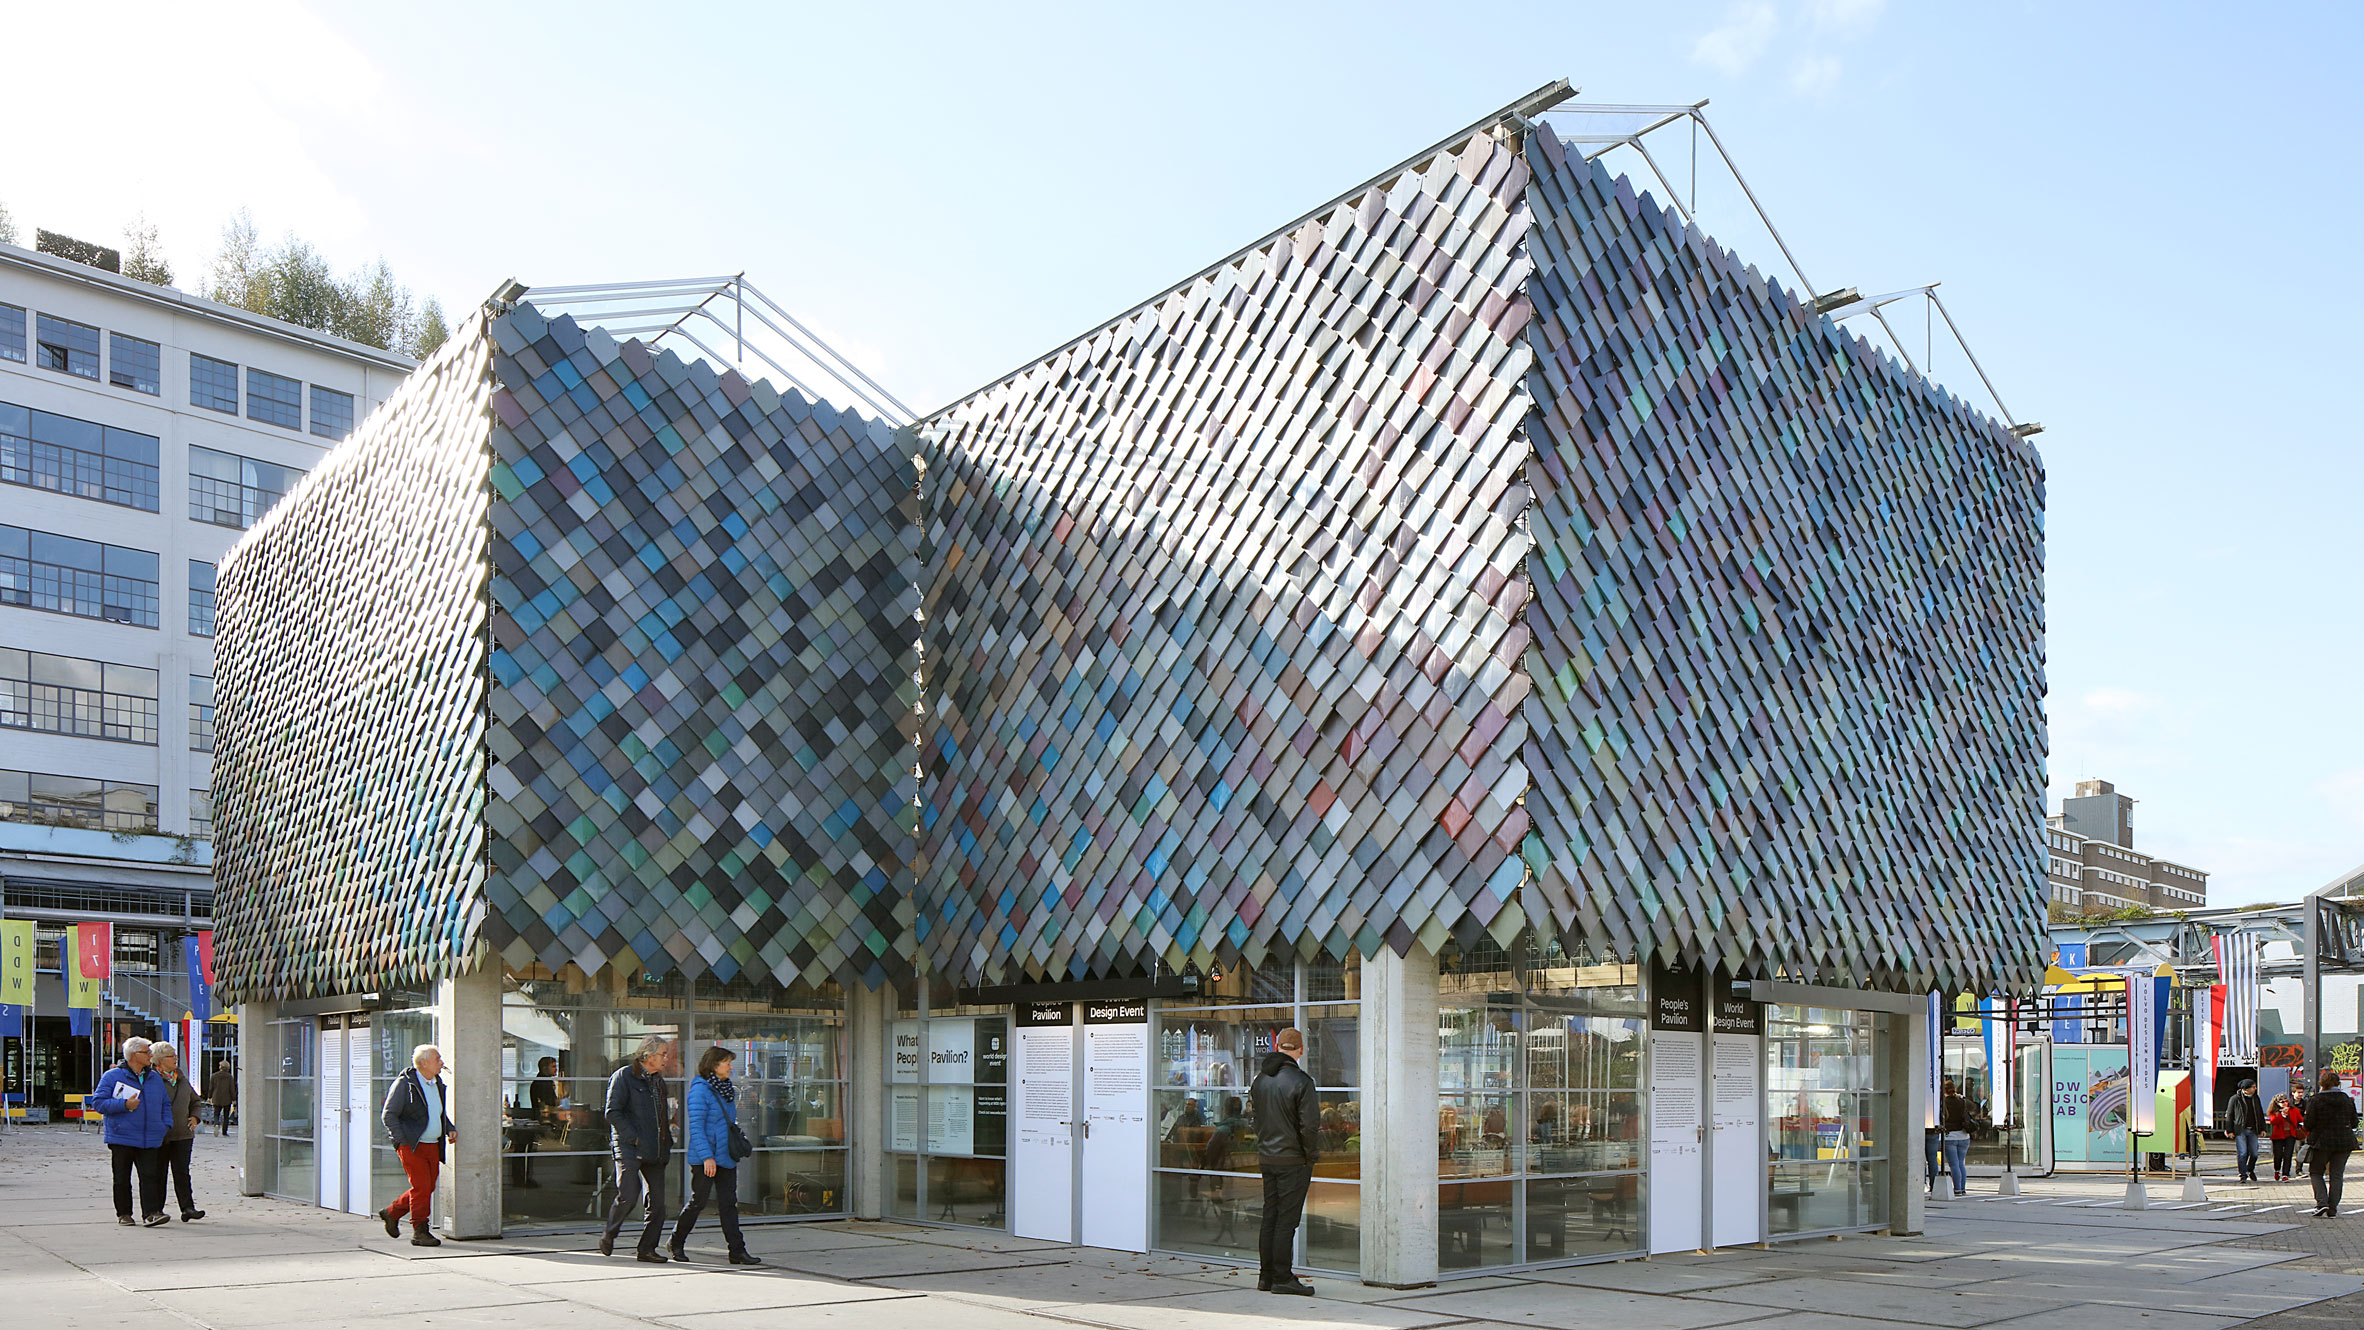 The People's Pavilion